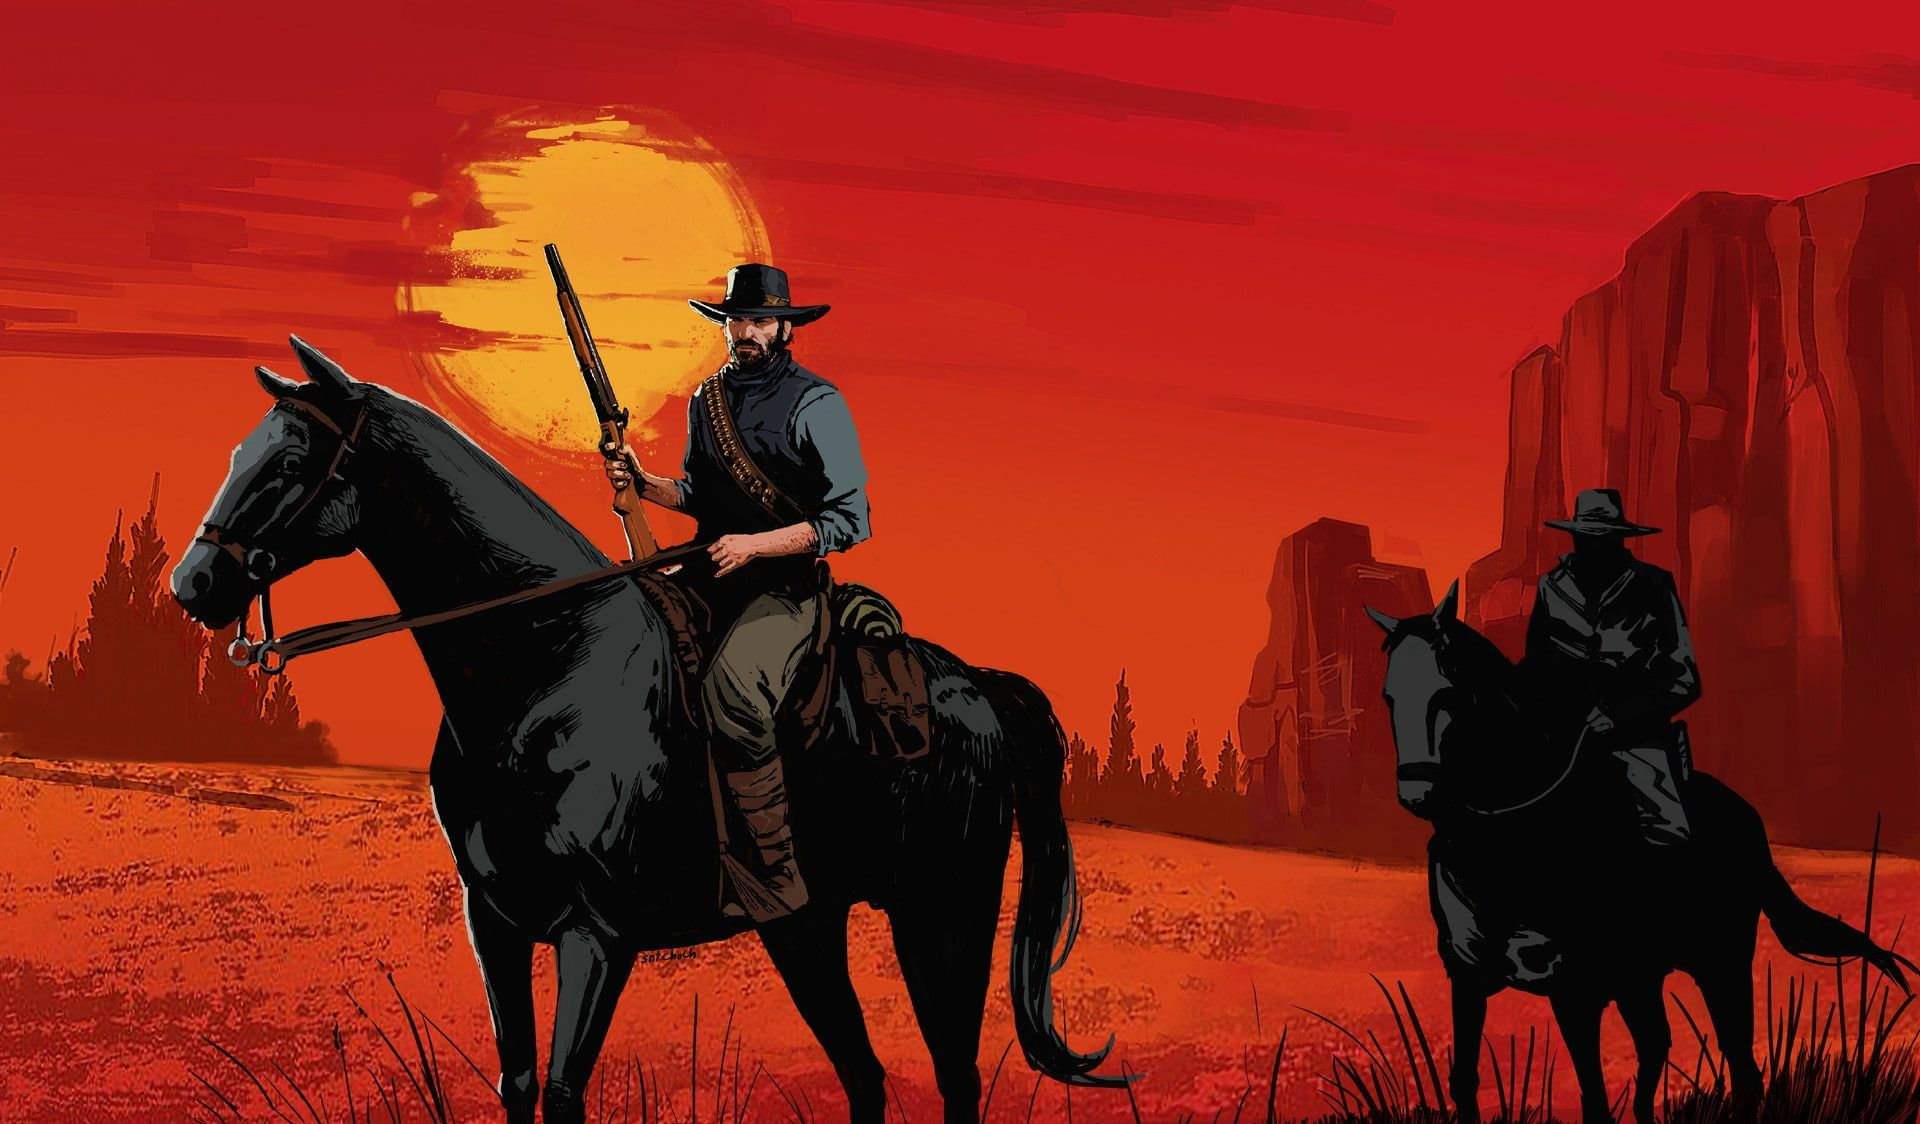 Red Dead Red Dead Redemption 2 Arthur Morgan 1080p Wallpaper Hdwallpaper Desktop In 2020 Red Dead Redemption Concept Art Red Dead Redemption Red Dead Redemption Ii